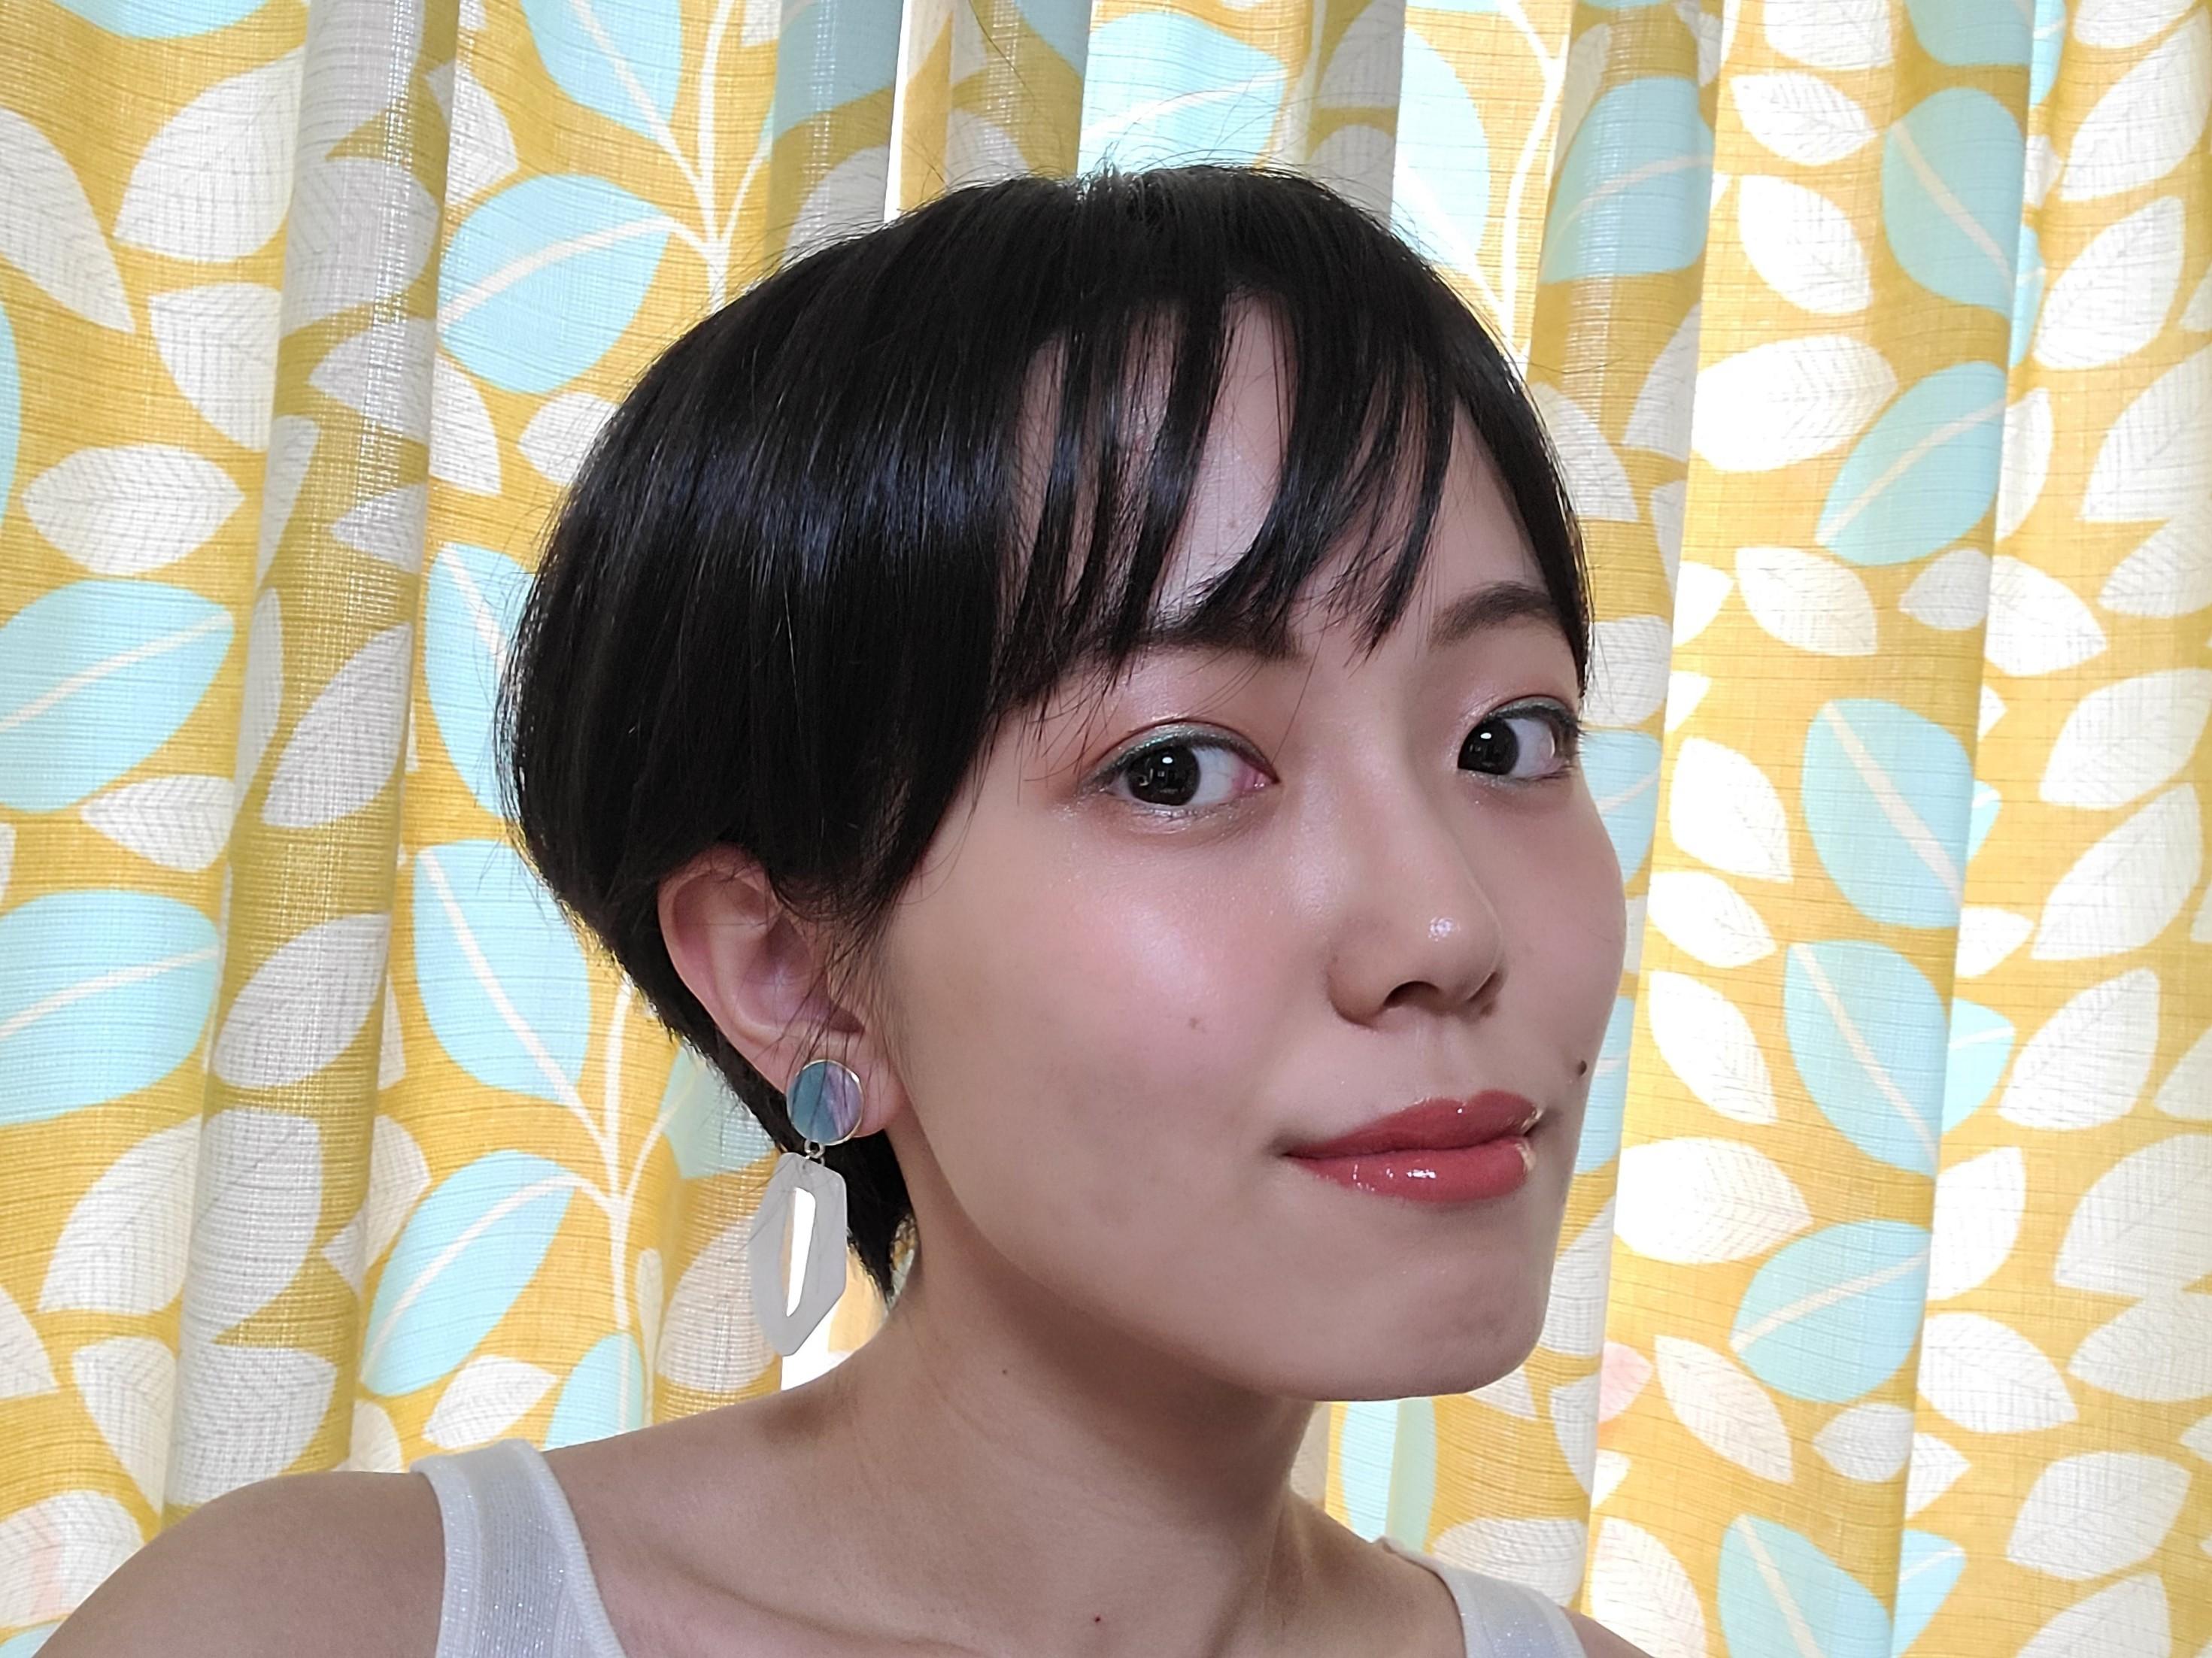 【LUNASOL】気分上がる!フラッシュクリエイーター☆MintyOcean使い方研究☆_4